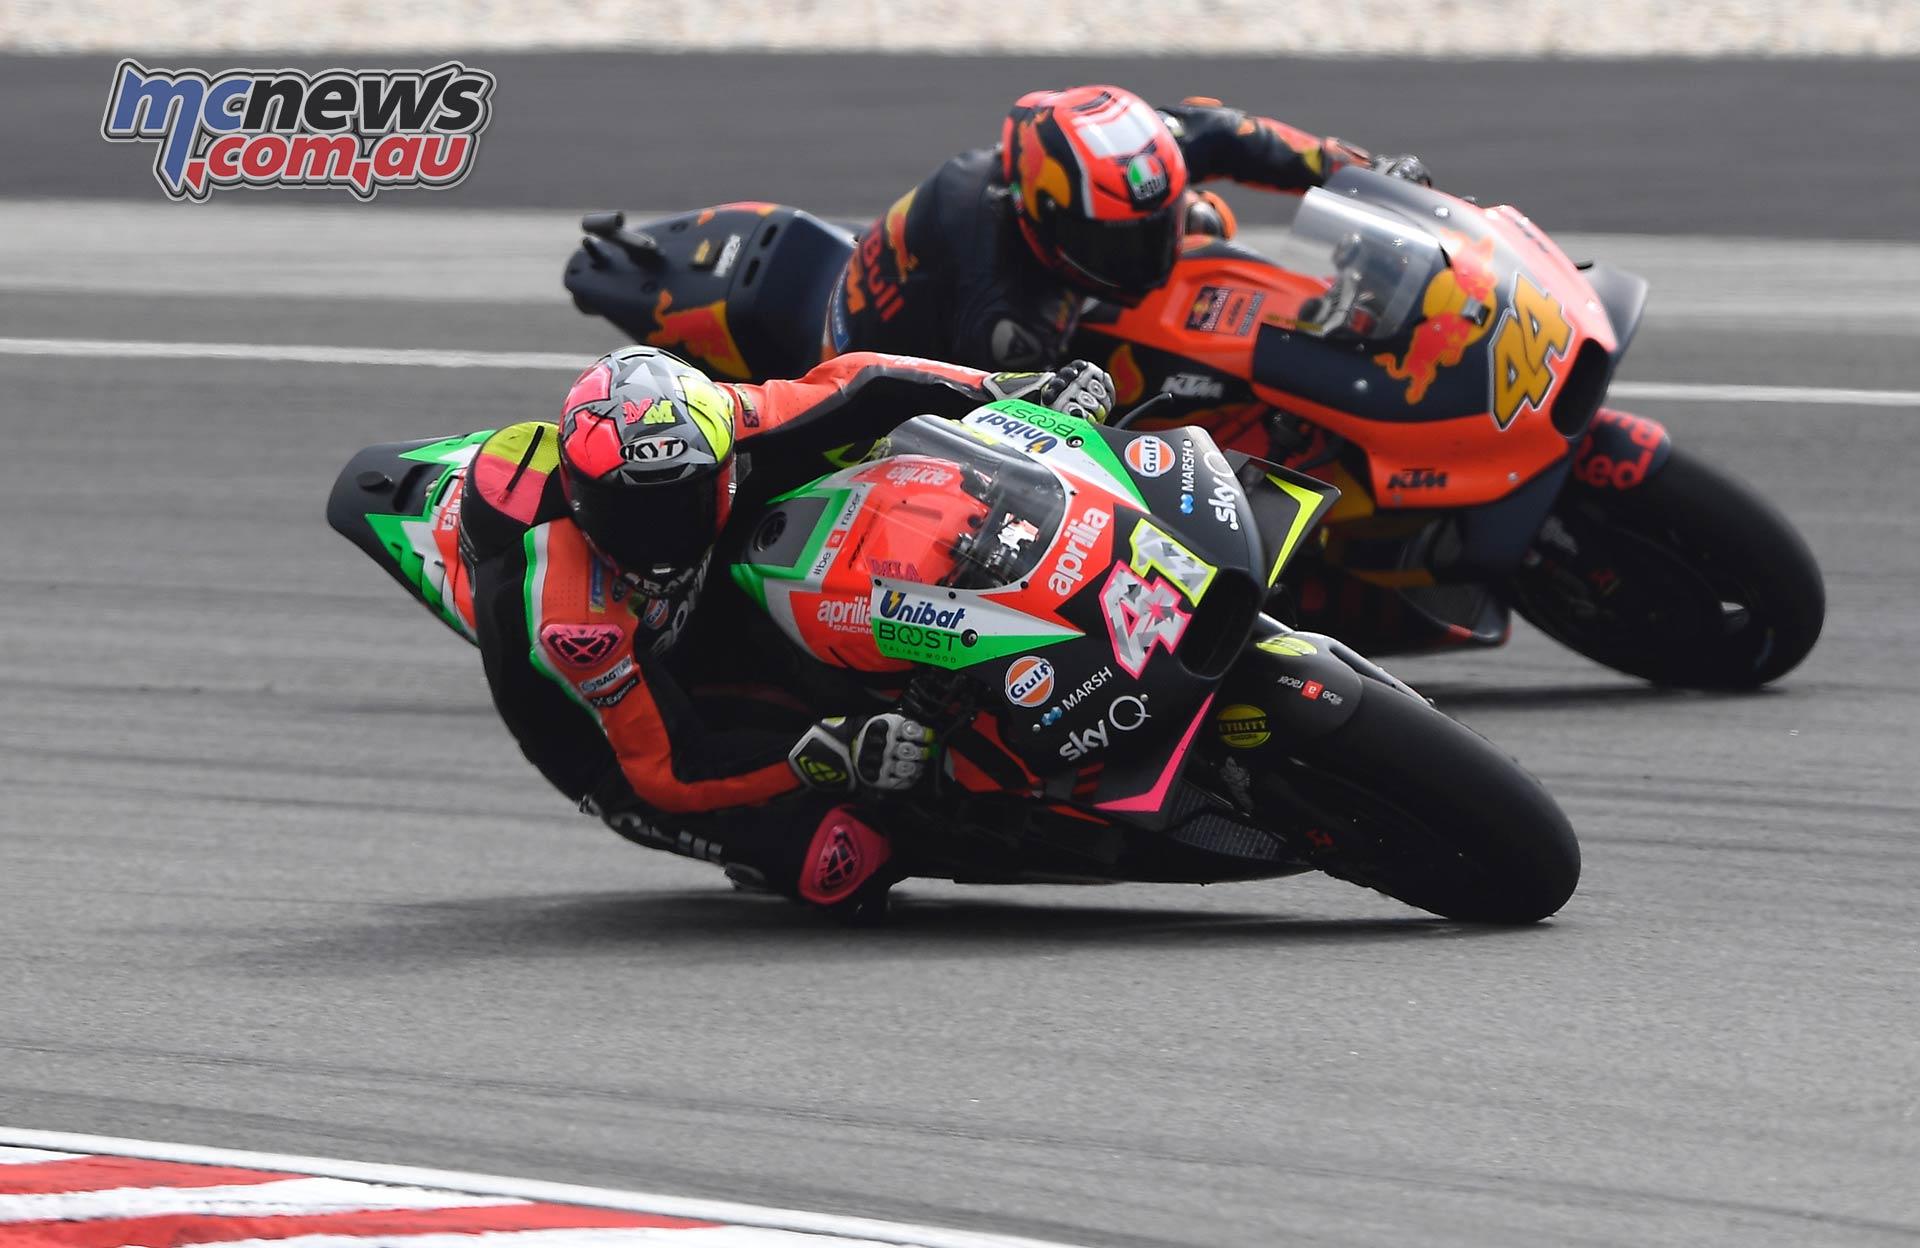 MotoGP Rnd Malaysia Aleix Espargaro